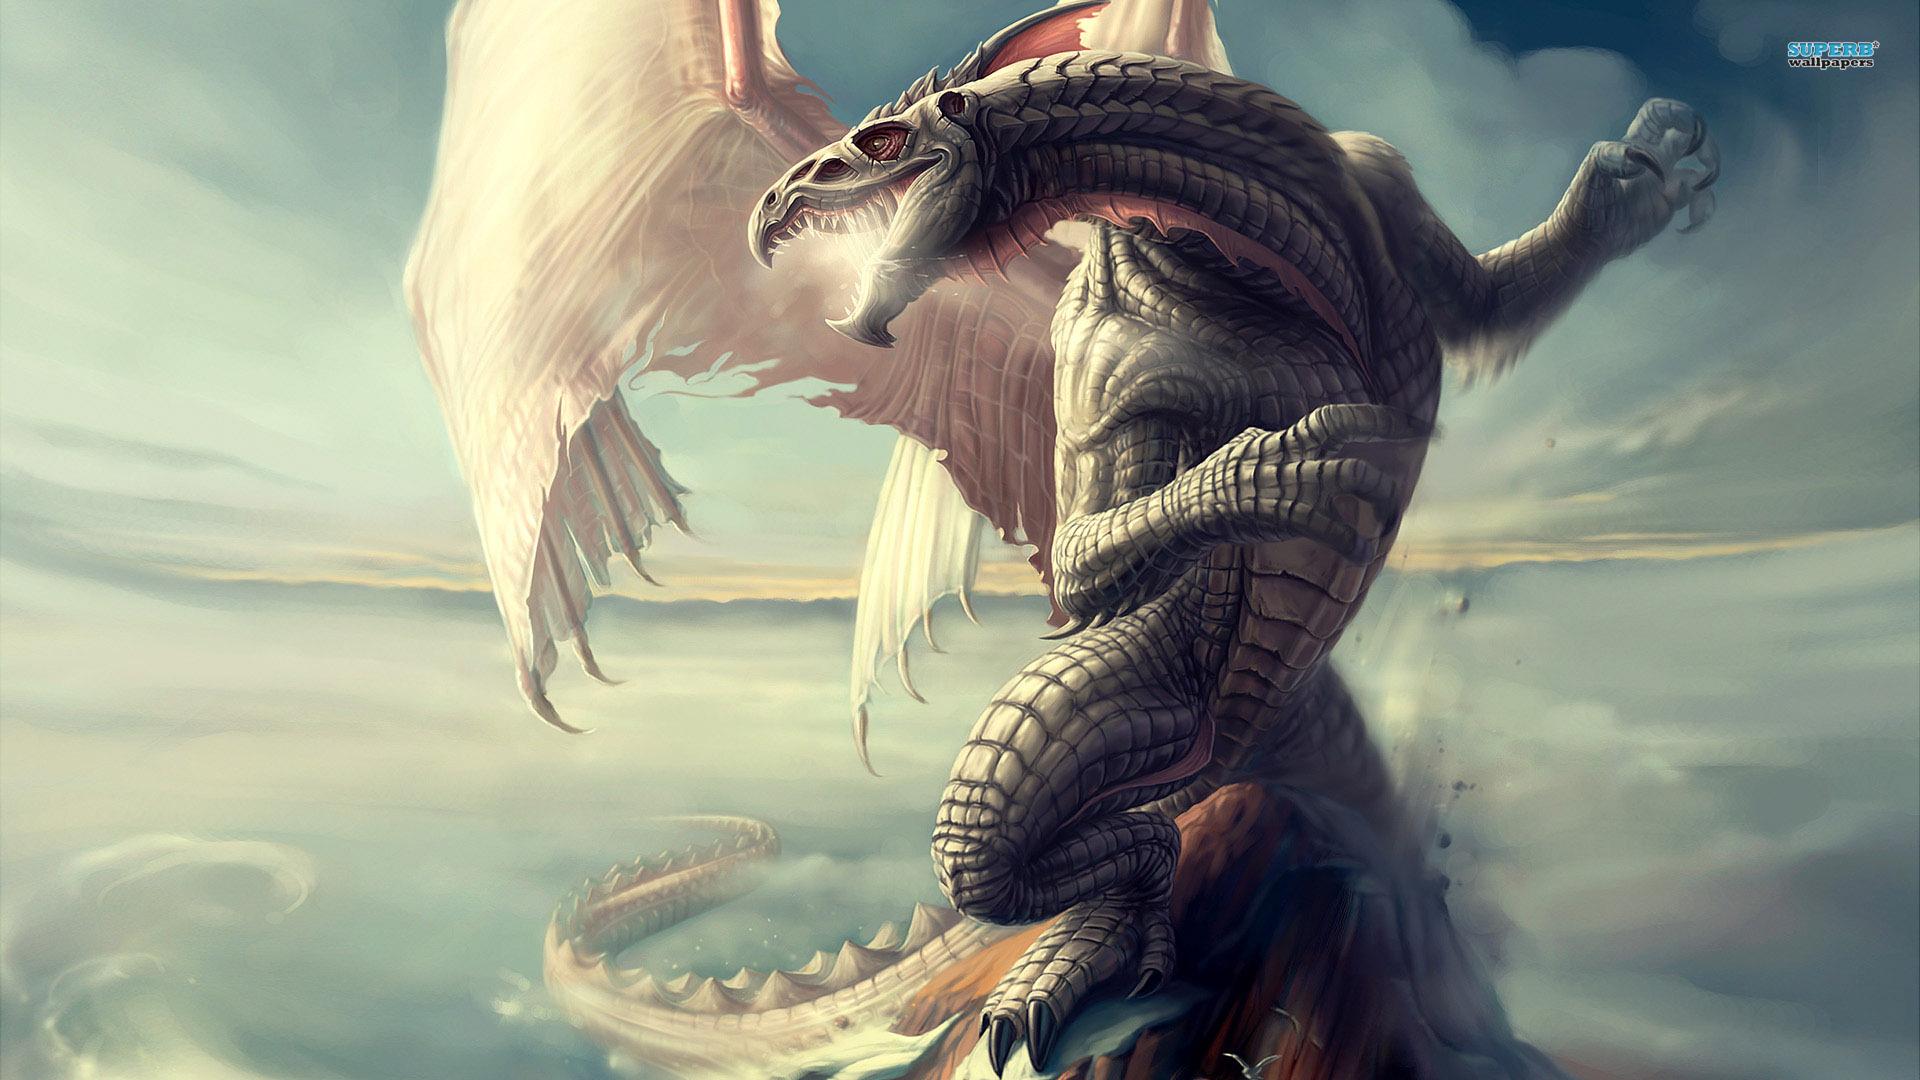 Dragon Full HD Wallpapers download 1080p desktop backgrounds 1920x1080